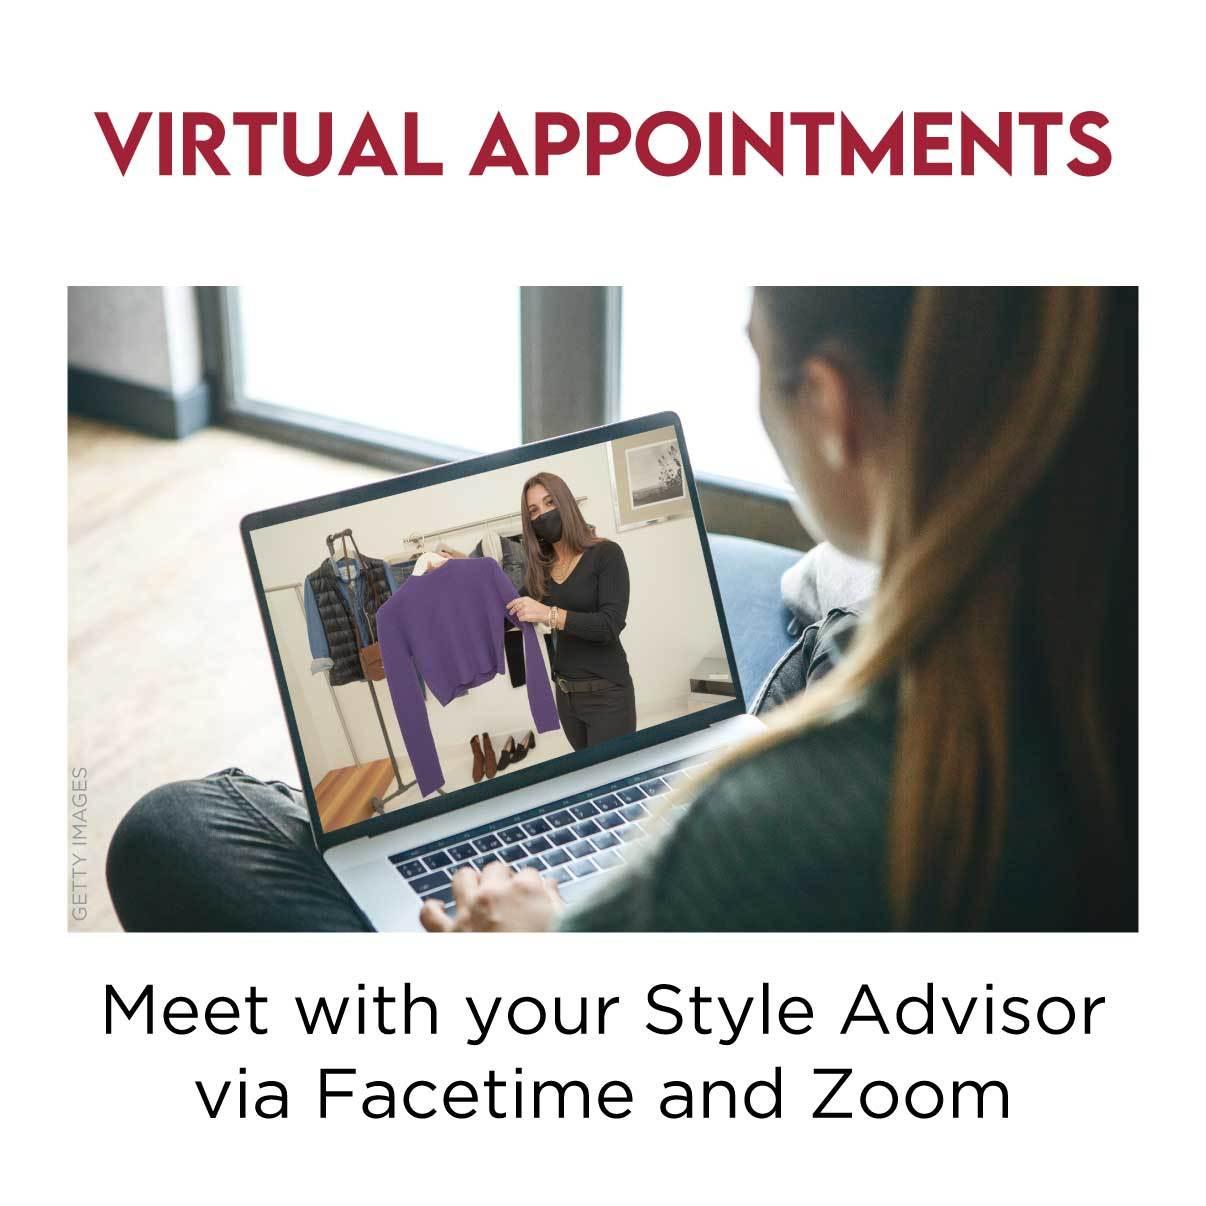 Virtual Apporintments